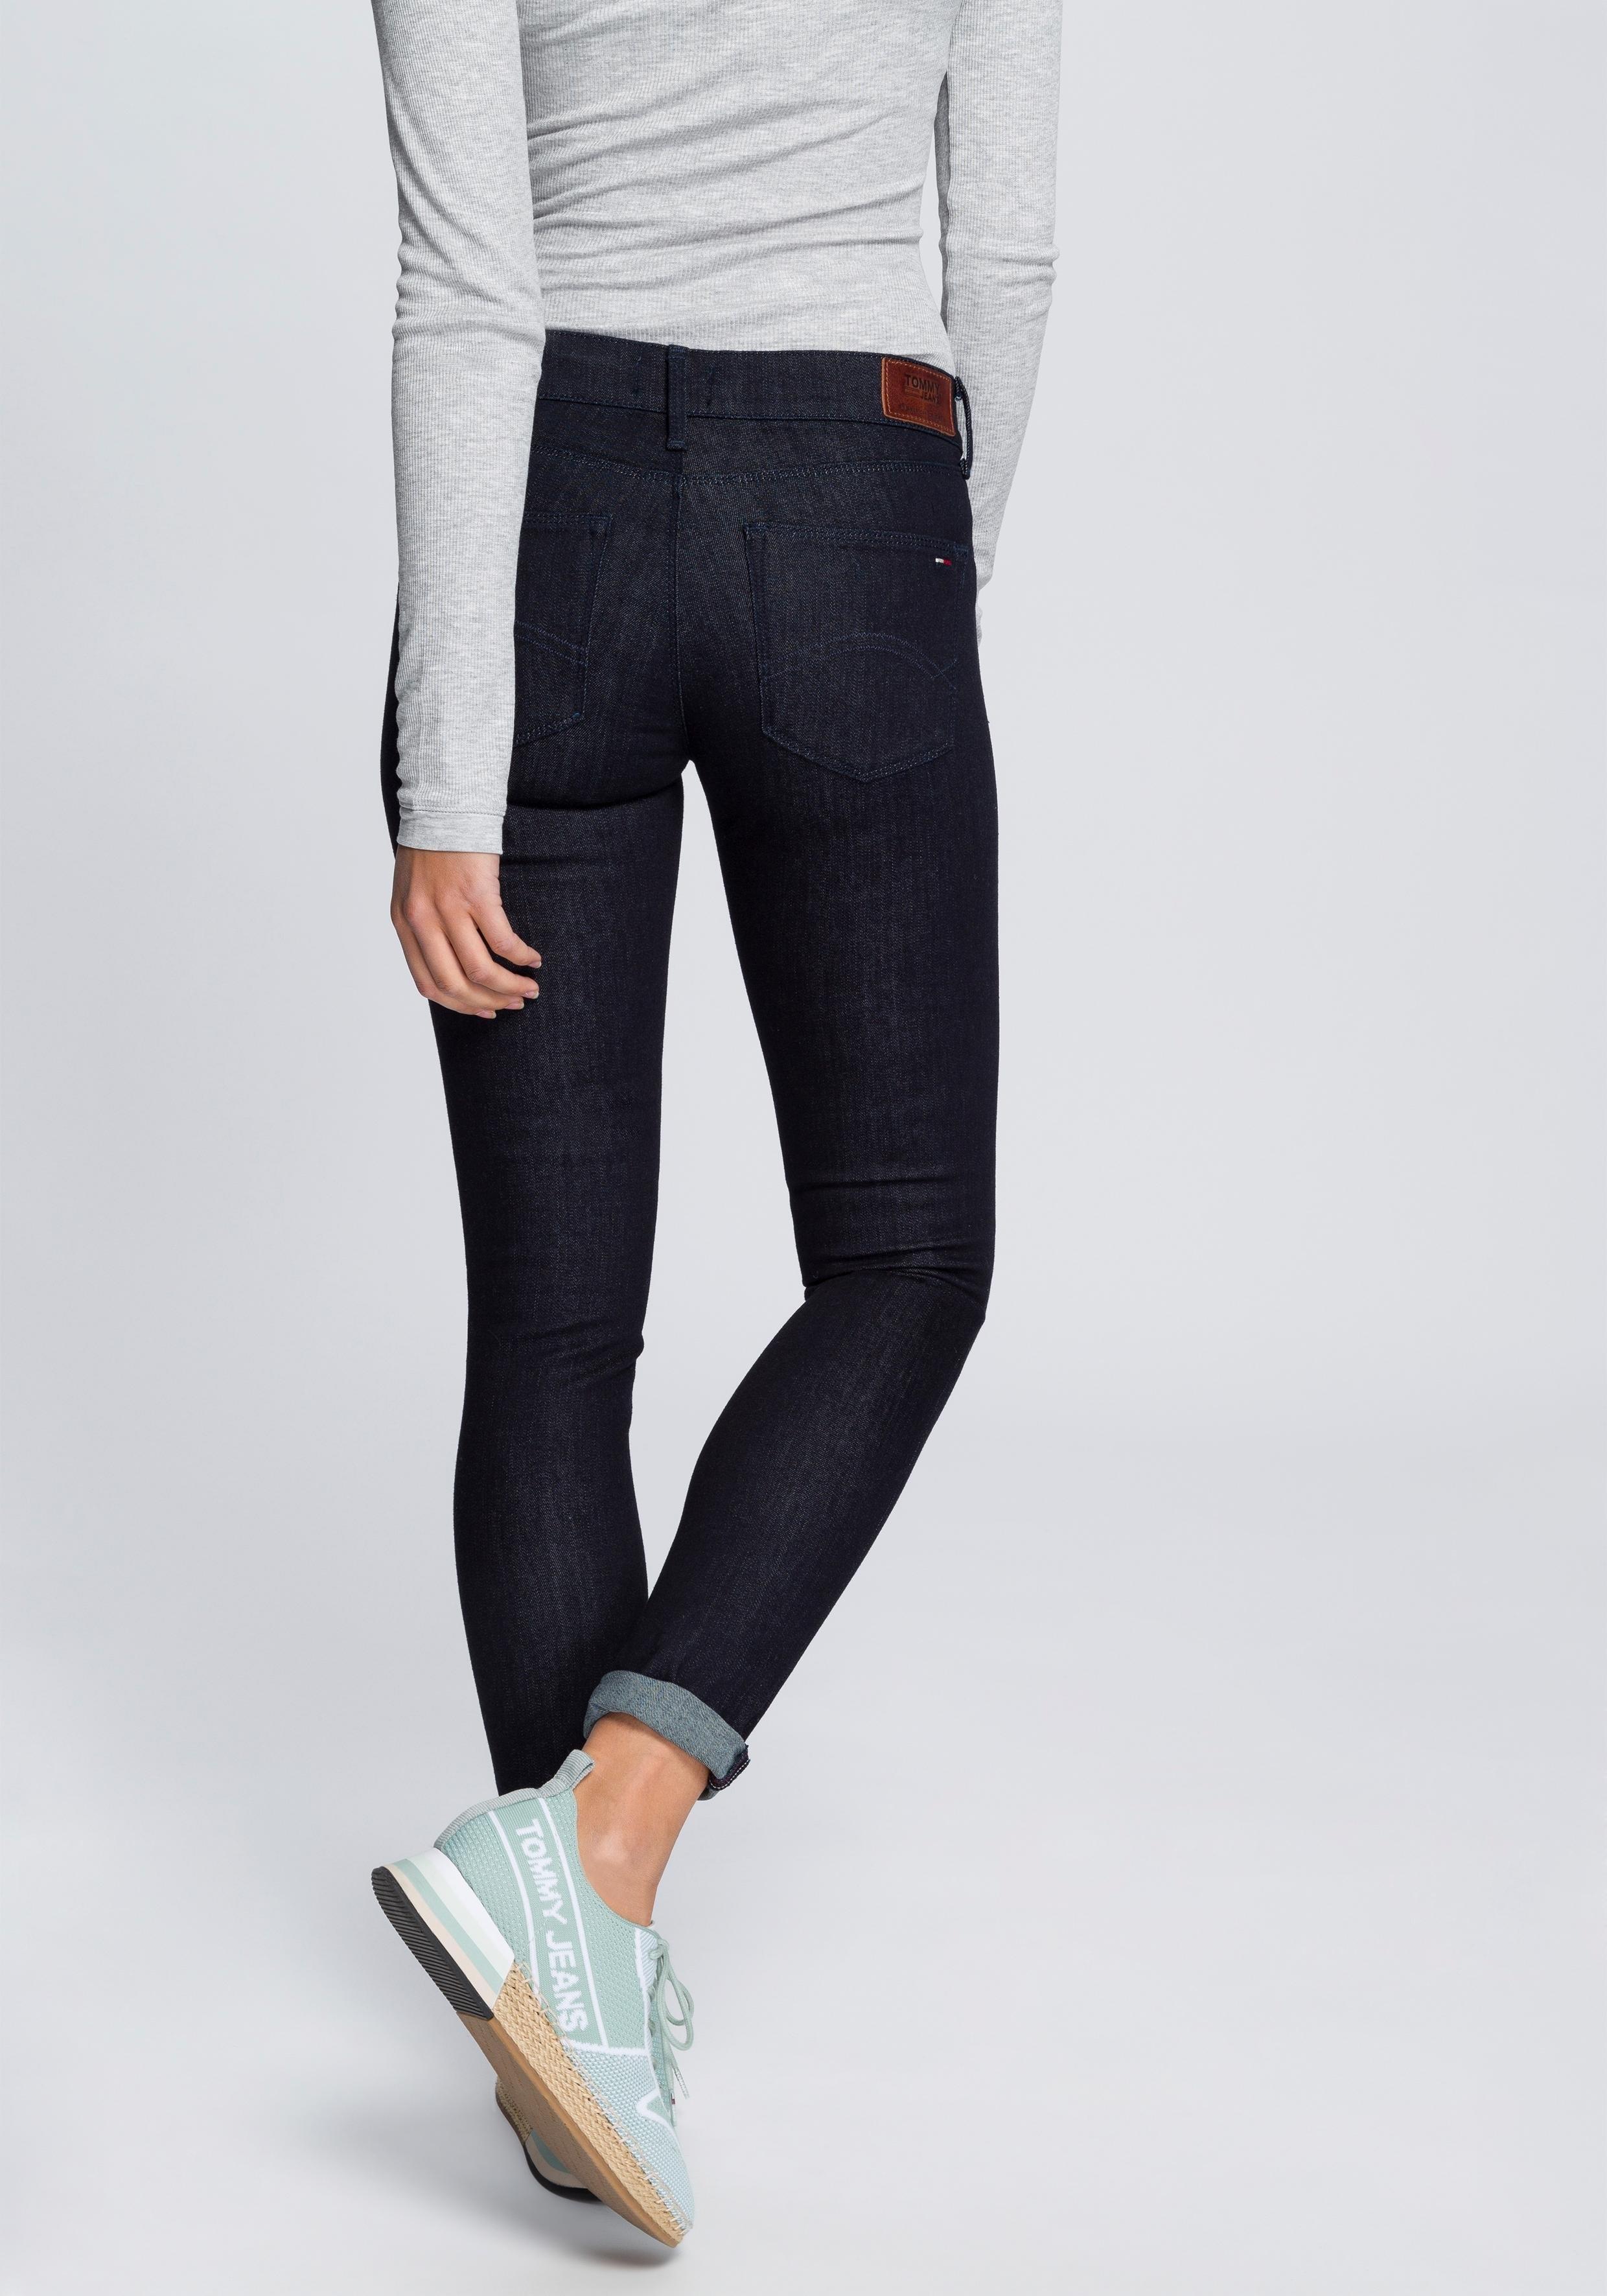 Tommy Jeans jeans »MID RISE SKINNY NORA NRST« in de webshop van OTTO kopen